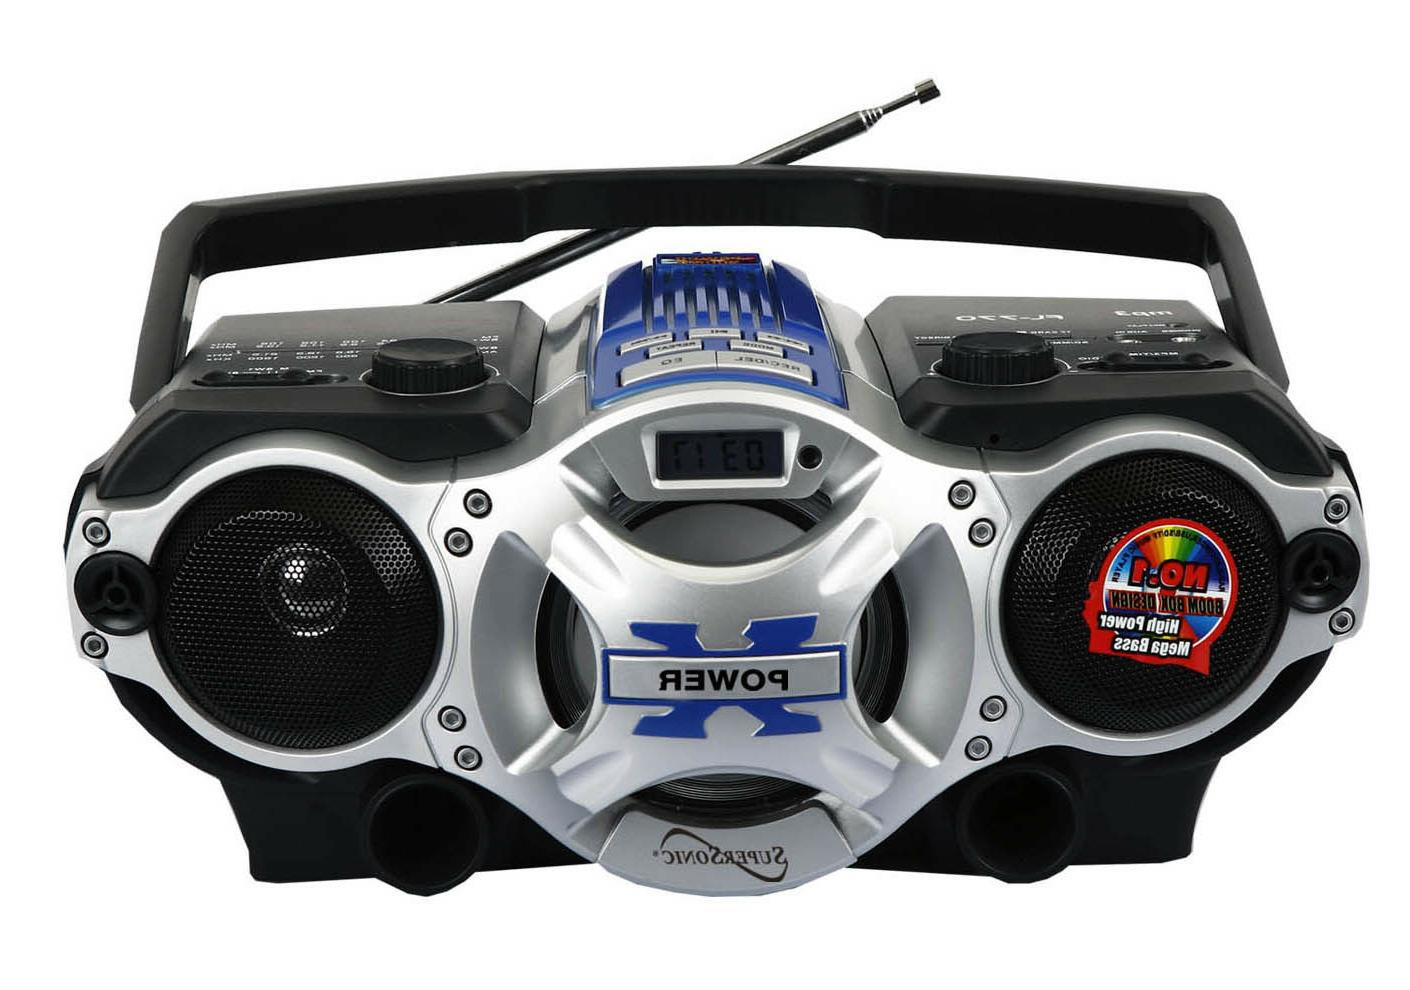 bluetooth portable boombox am fm radio mp3